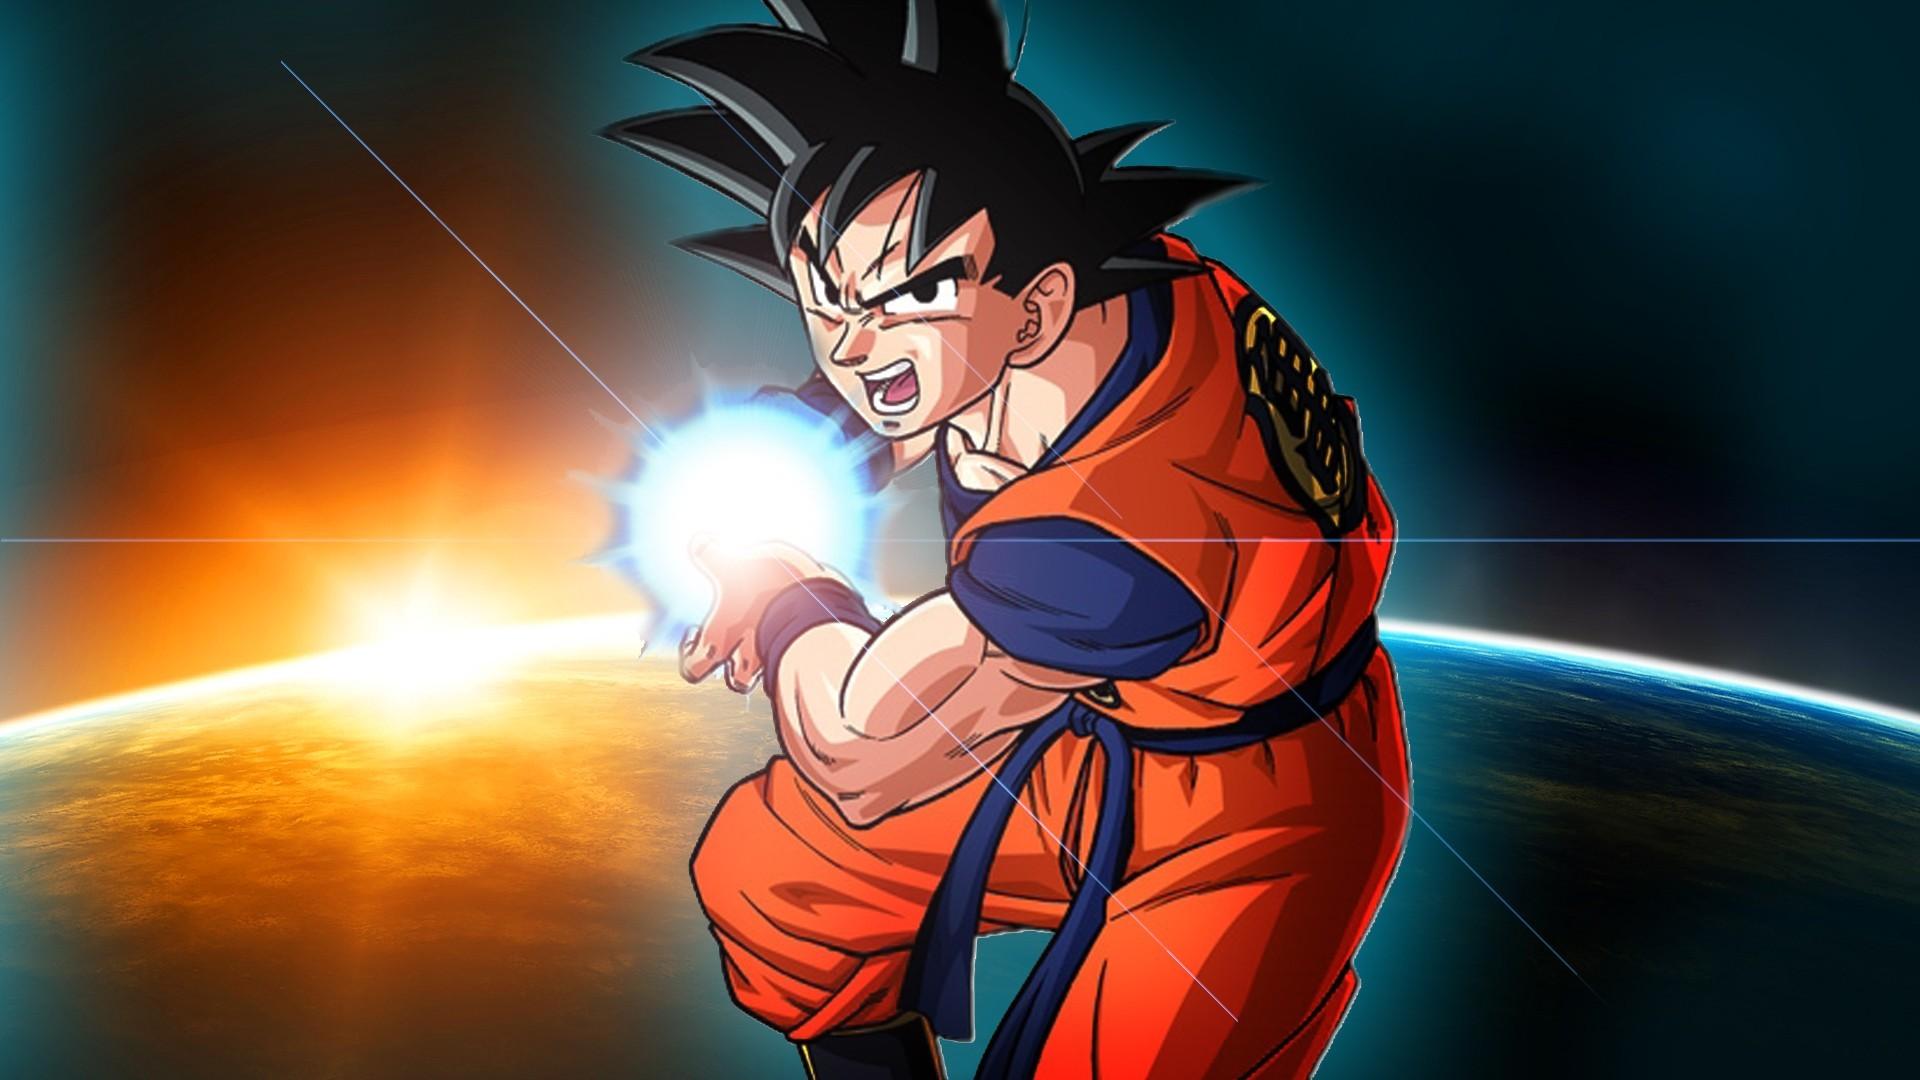 Dbz Wallpaper Goku Kamehameha